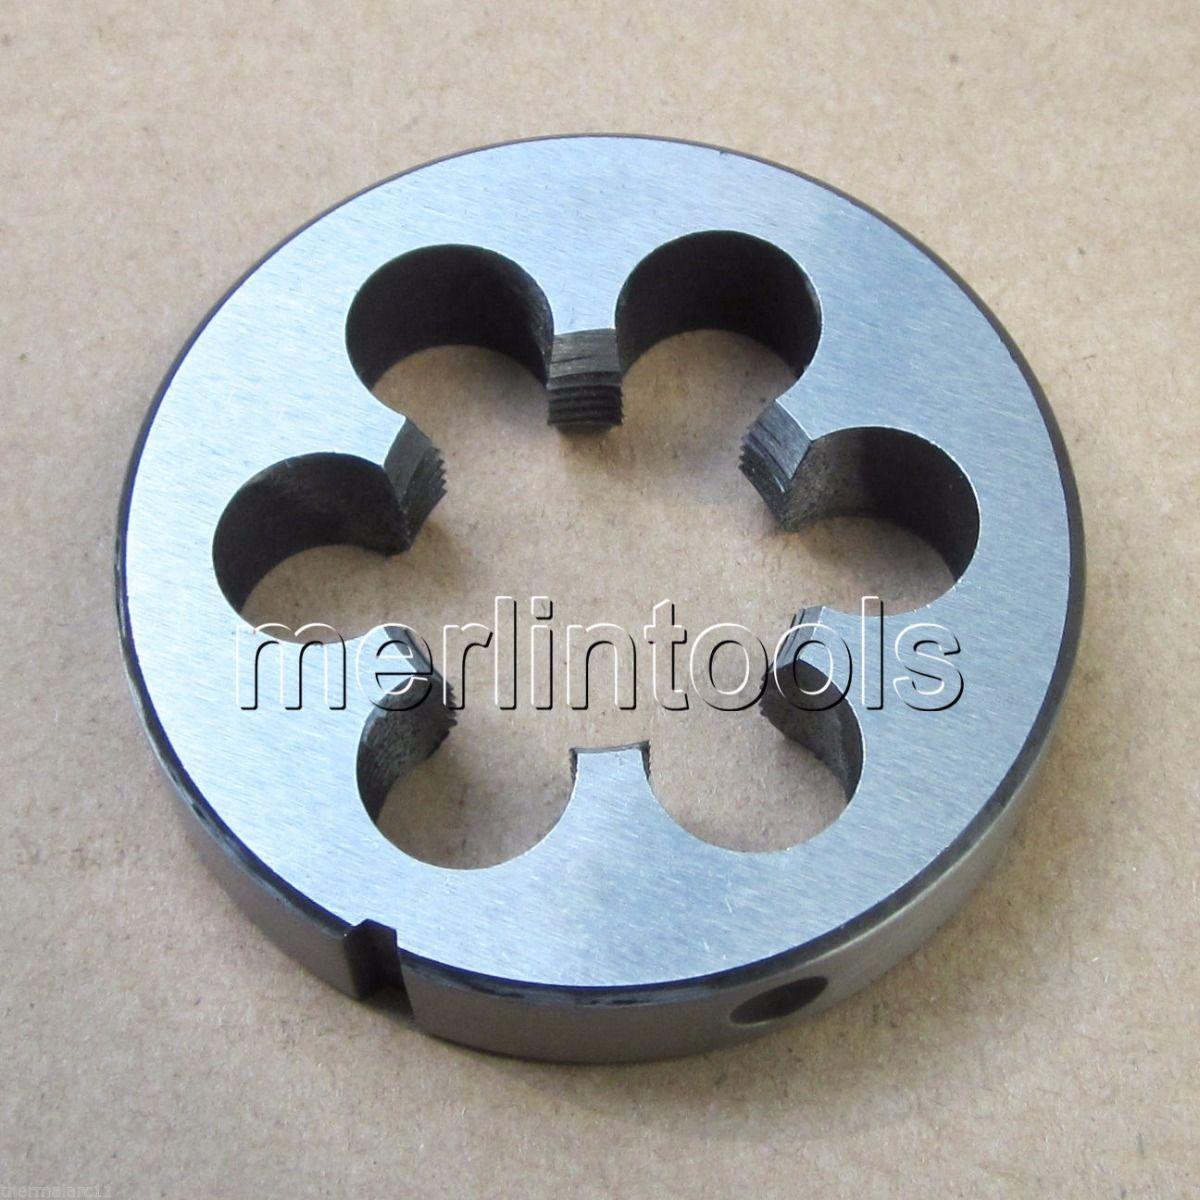 30mm x 1 Metric Left hand Die M30 x 1.0mm Pitch  цены